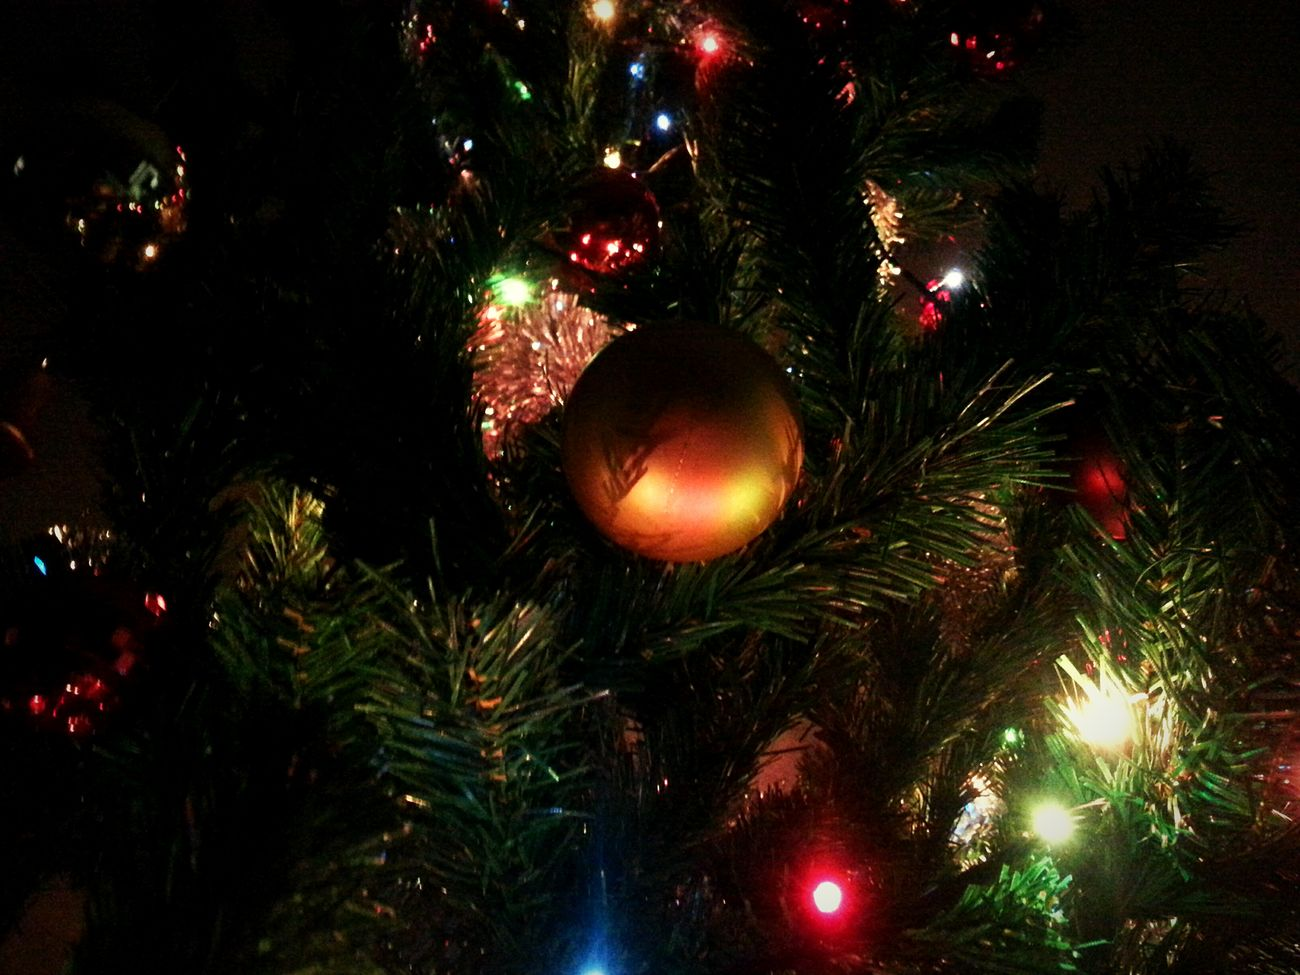 Christmas Christmas Tree Christmas Lights Christmas Decorations Love It Like It